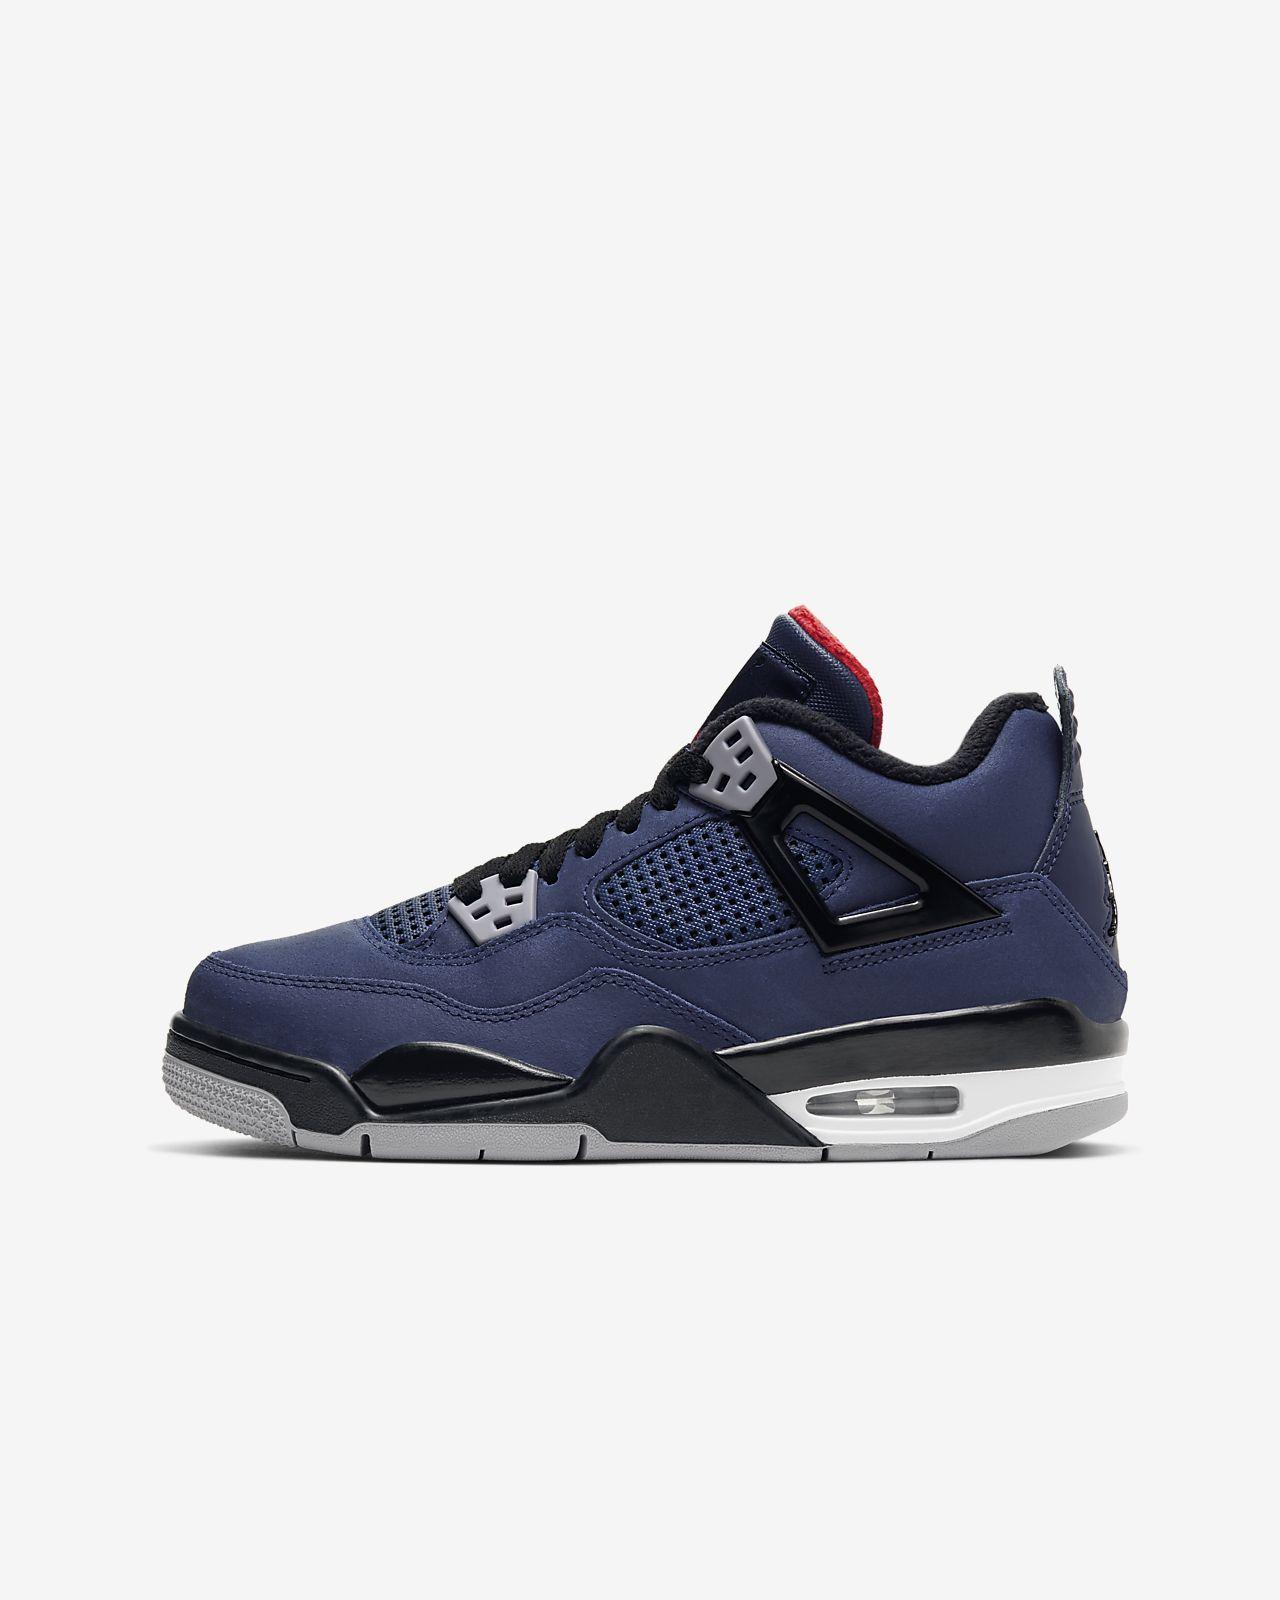 Air Jordan 4 Retro WNTR Older Kids' Shoe